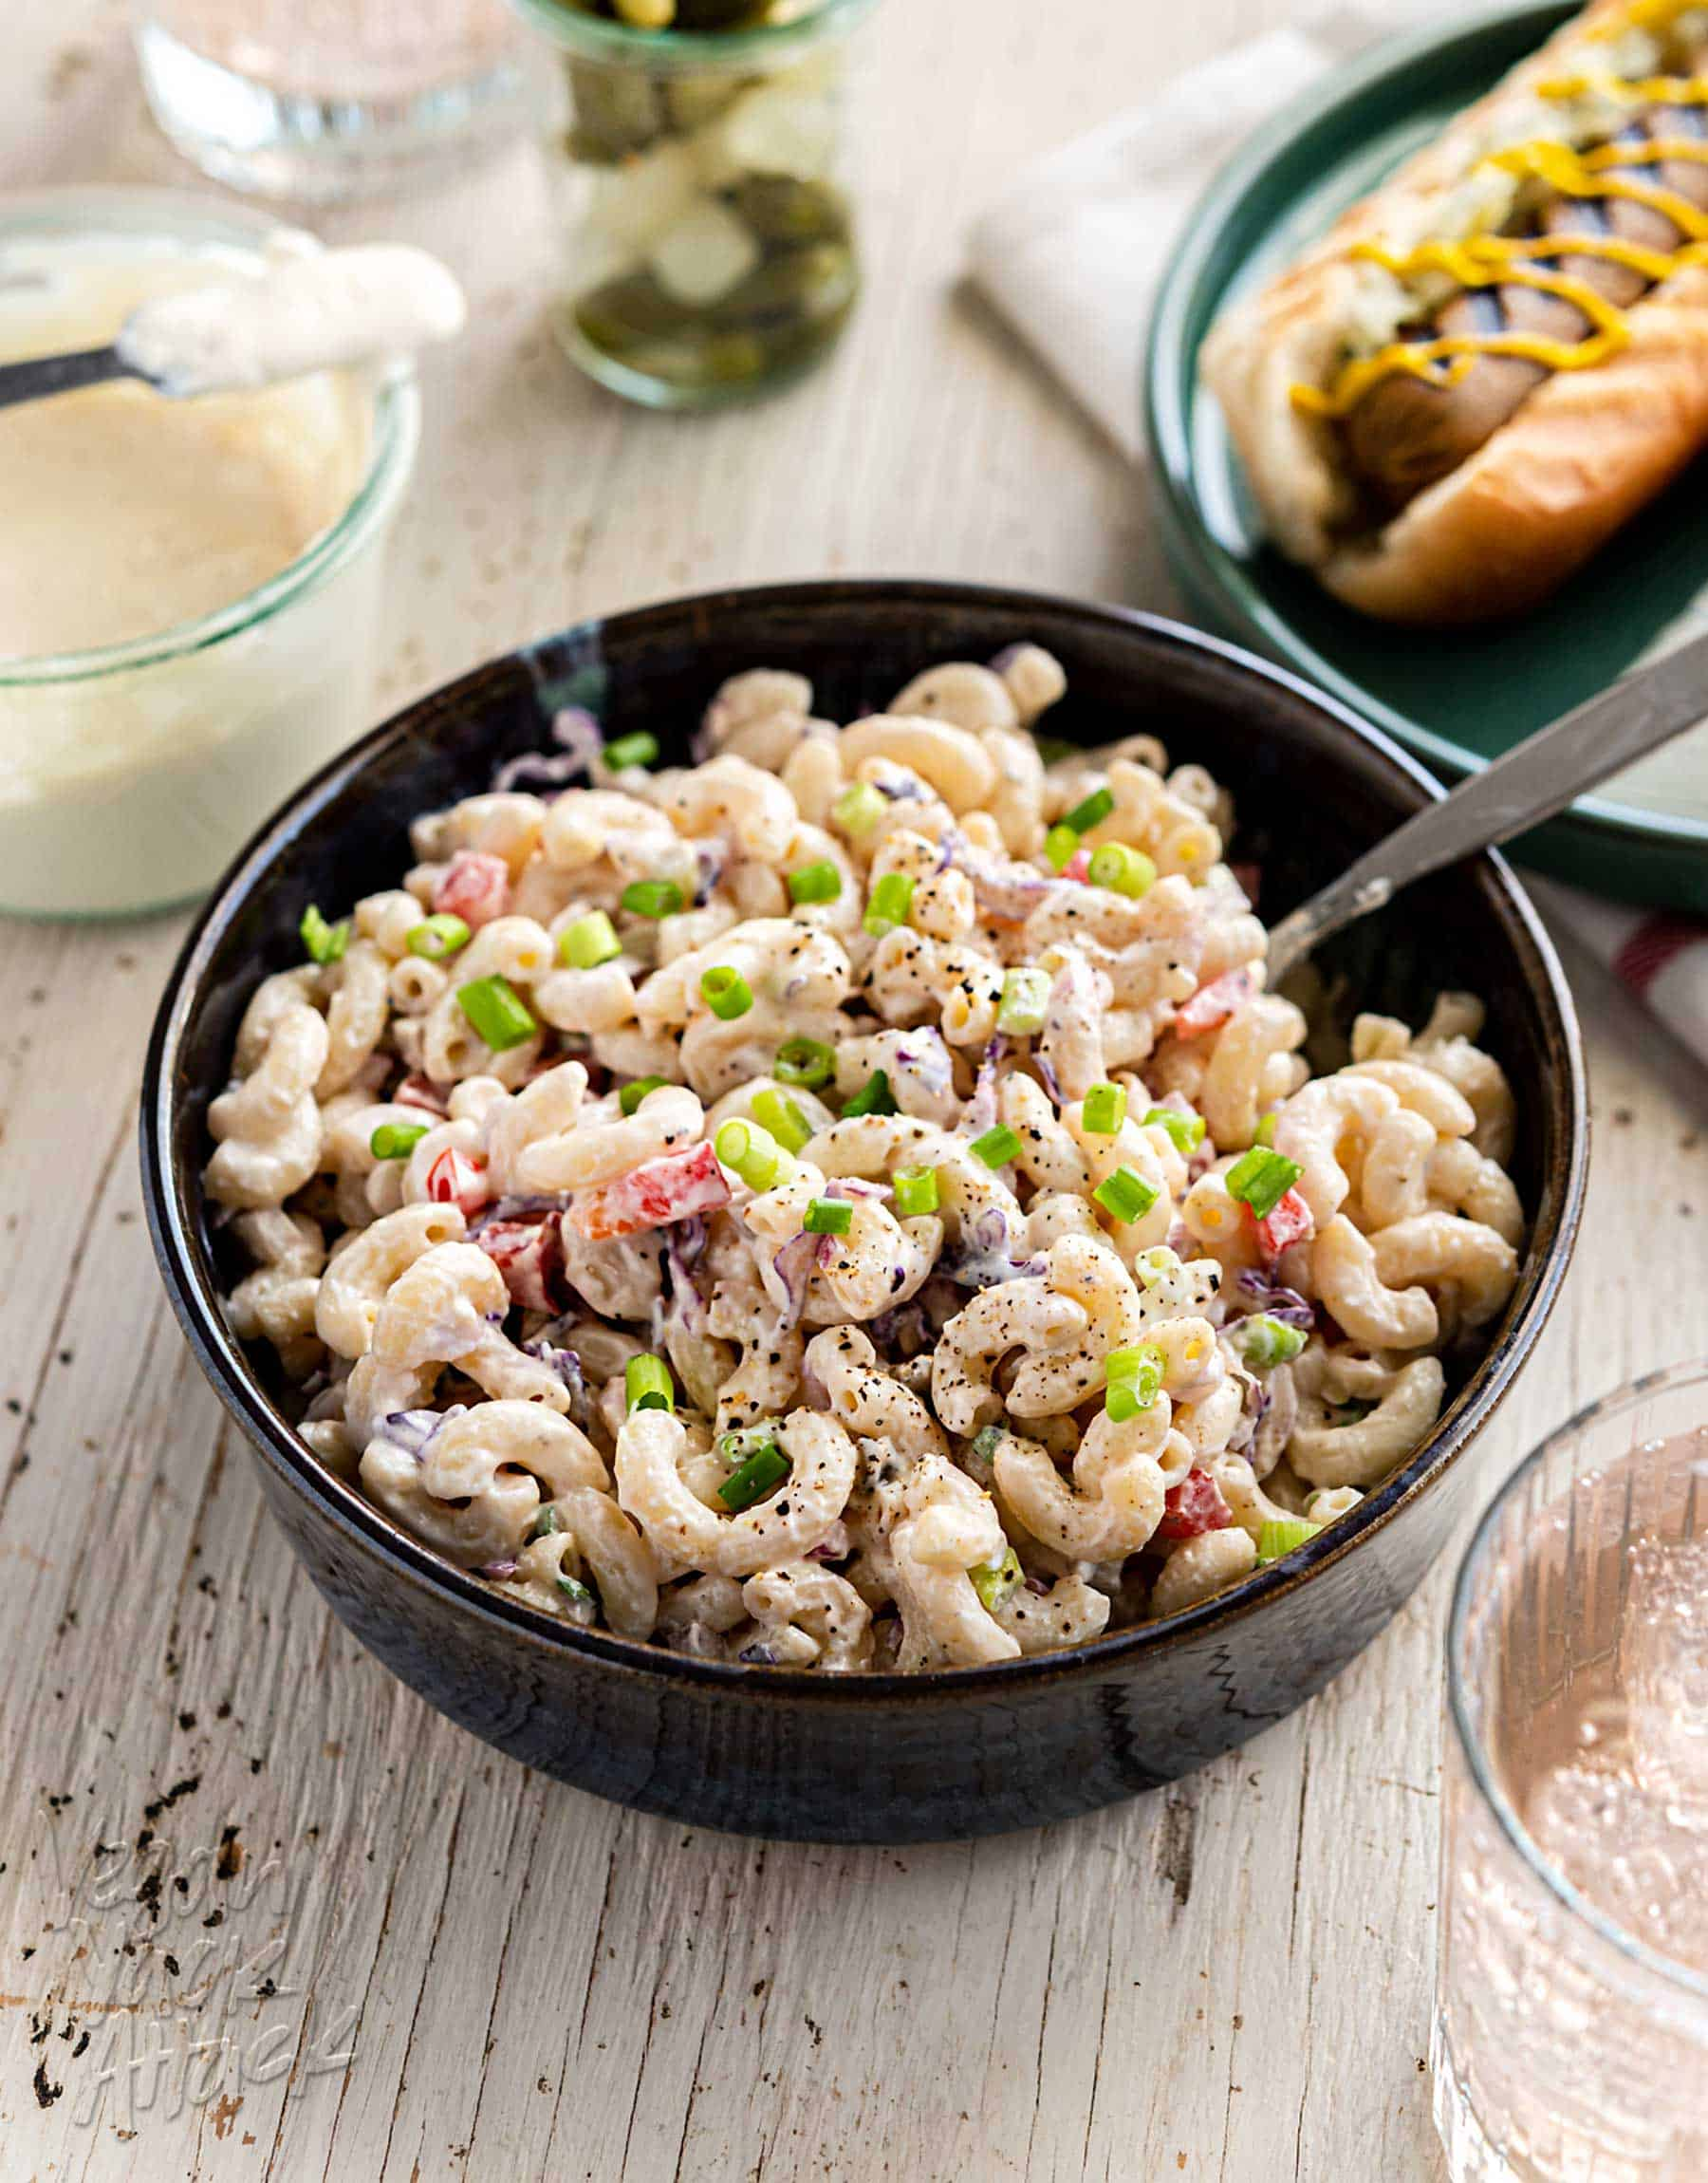 Large bowl of vegan macaroni salad on a white wood background